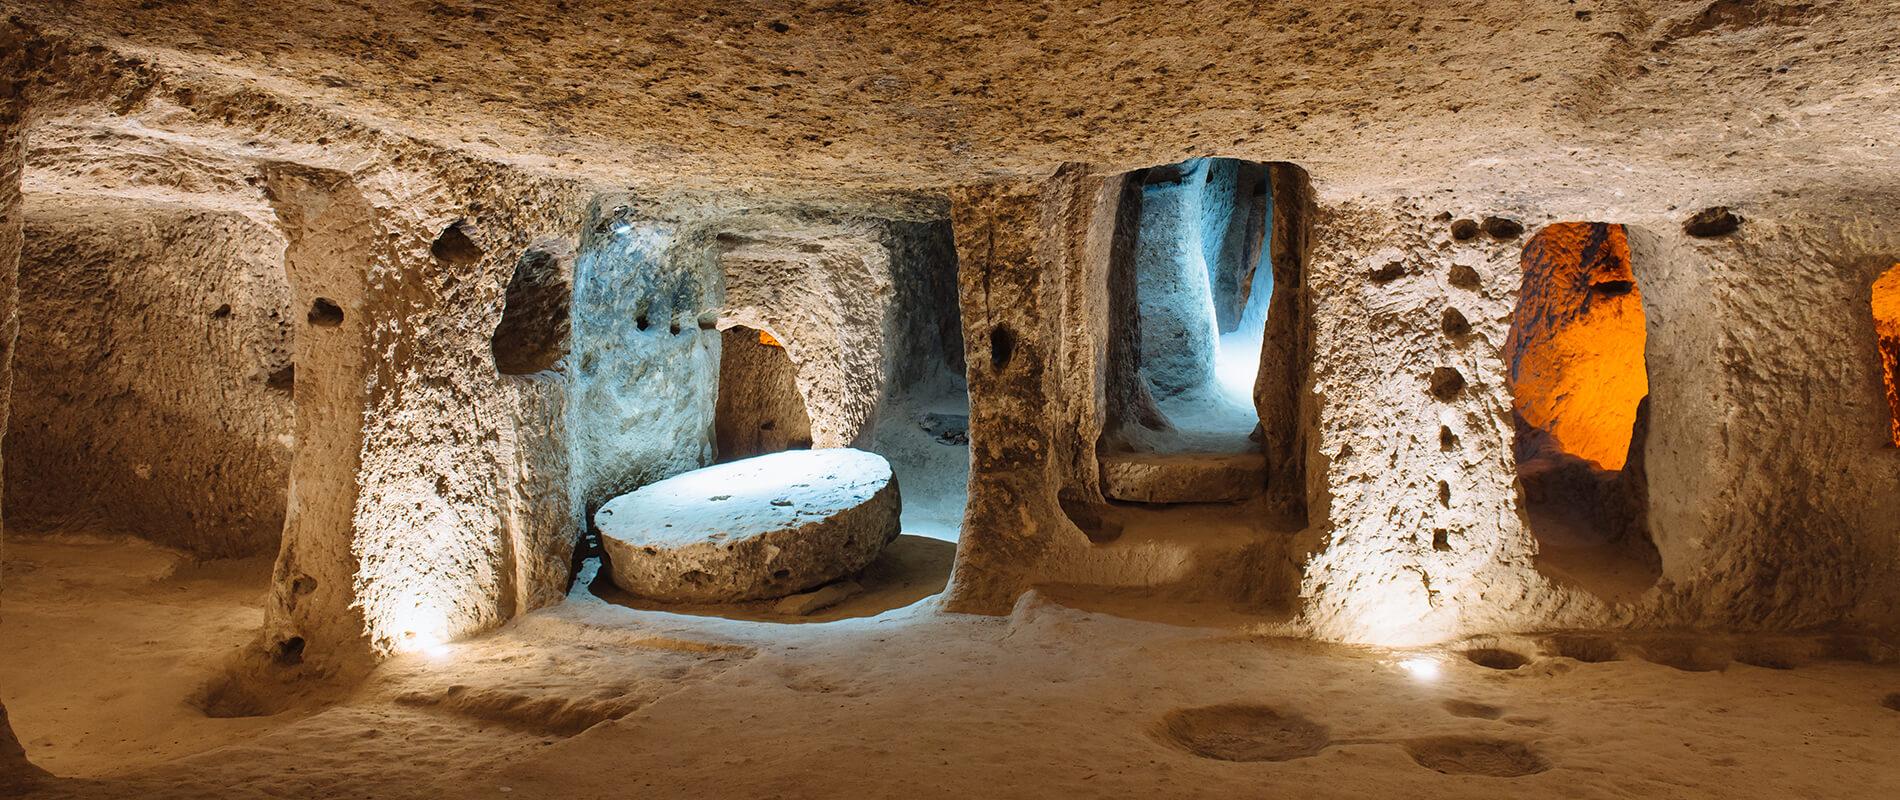 Derinkuyu, the extraordinary underground city of Turkey